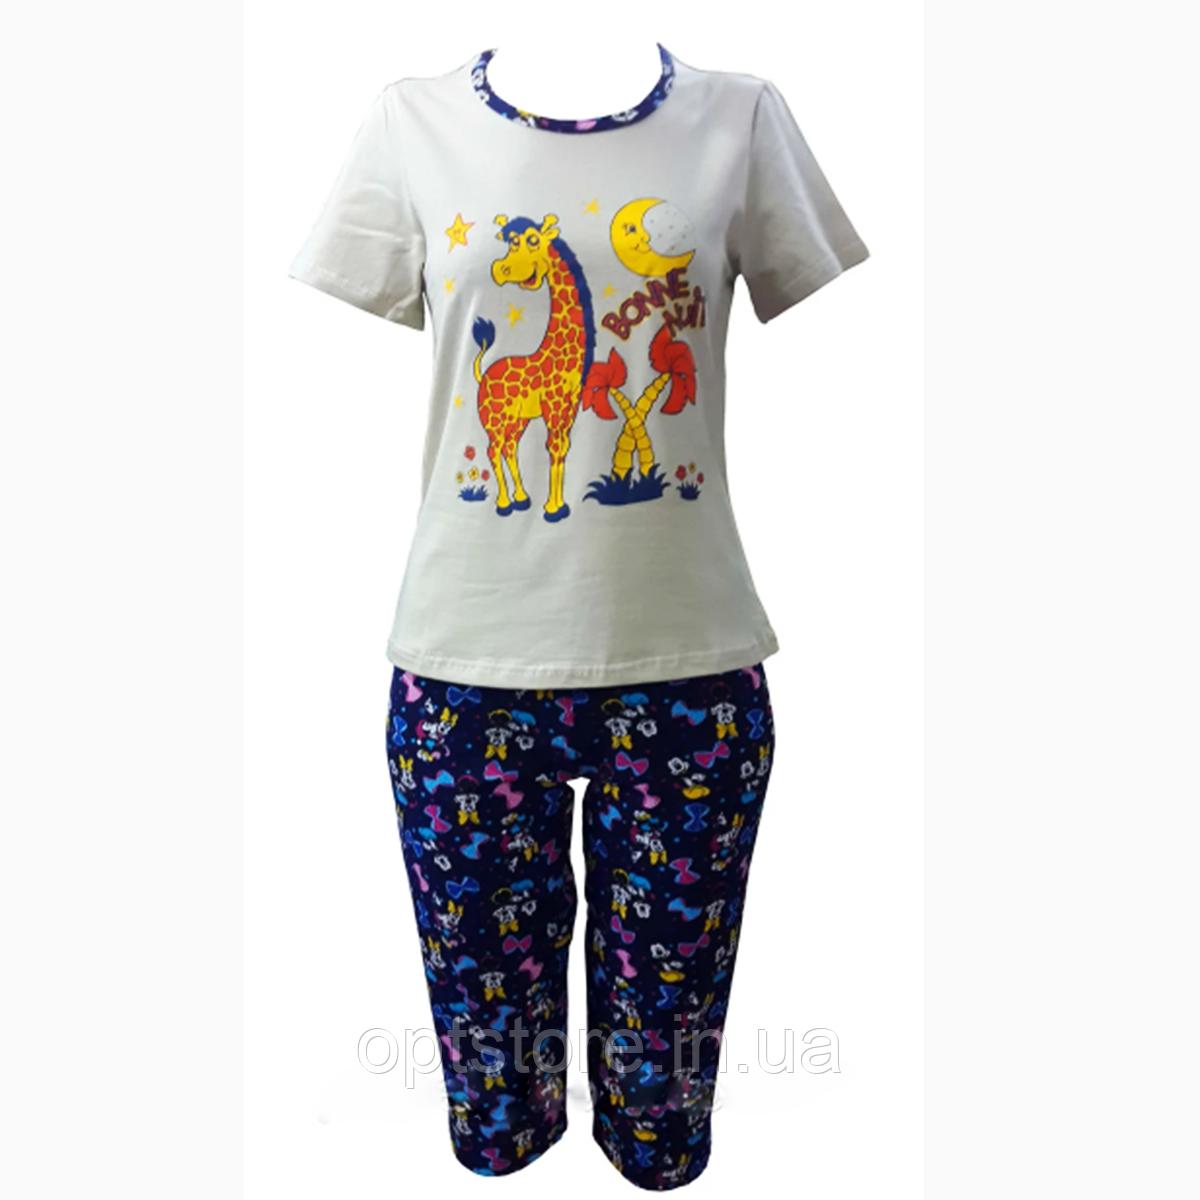 Річна піжама з капрі розмір 42-52